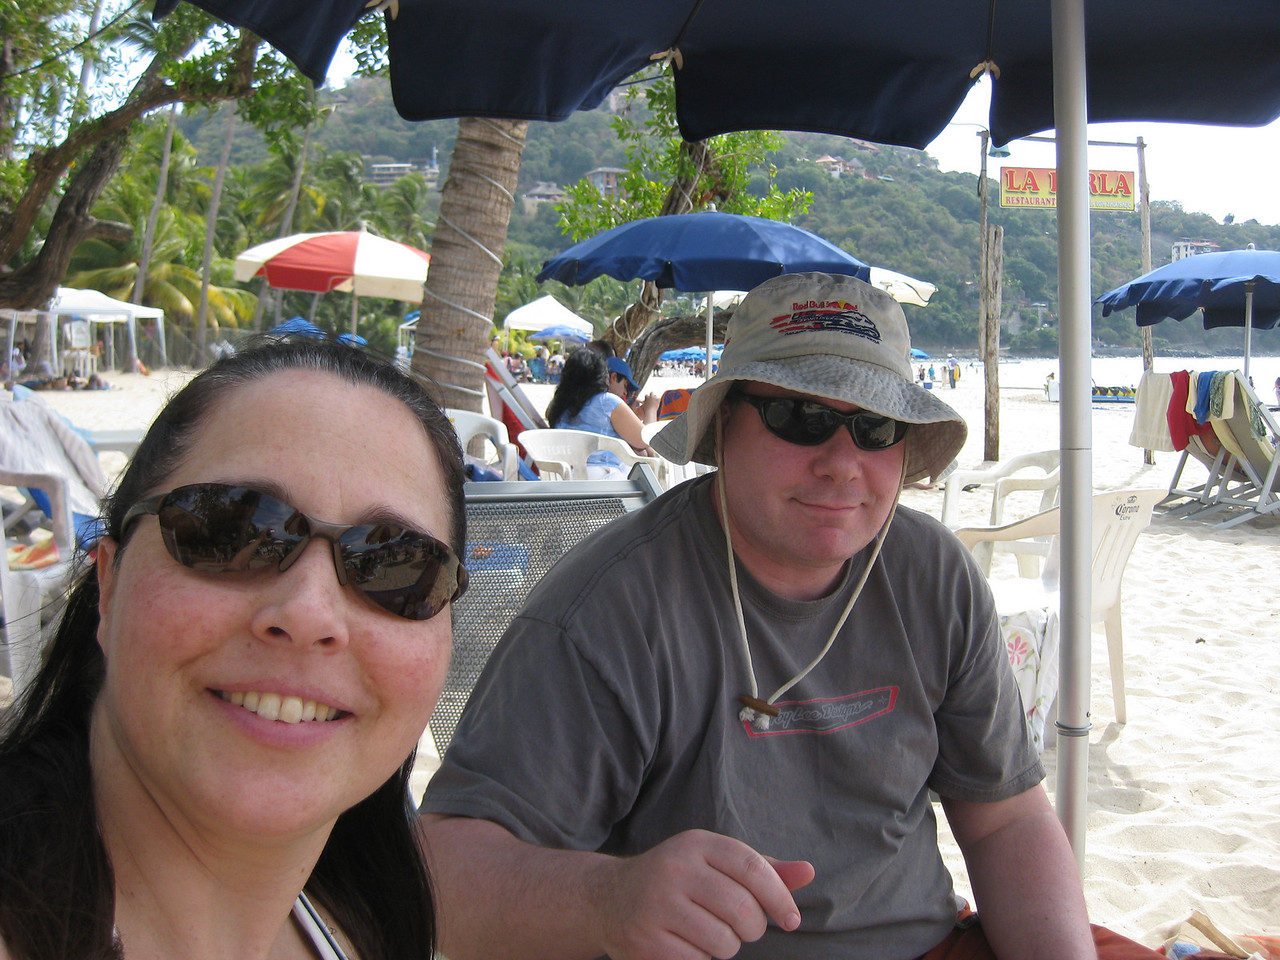 Hangin on Playa La Ropa at Perla's